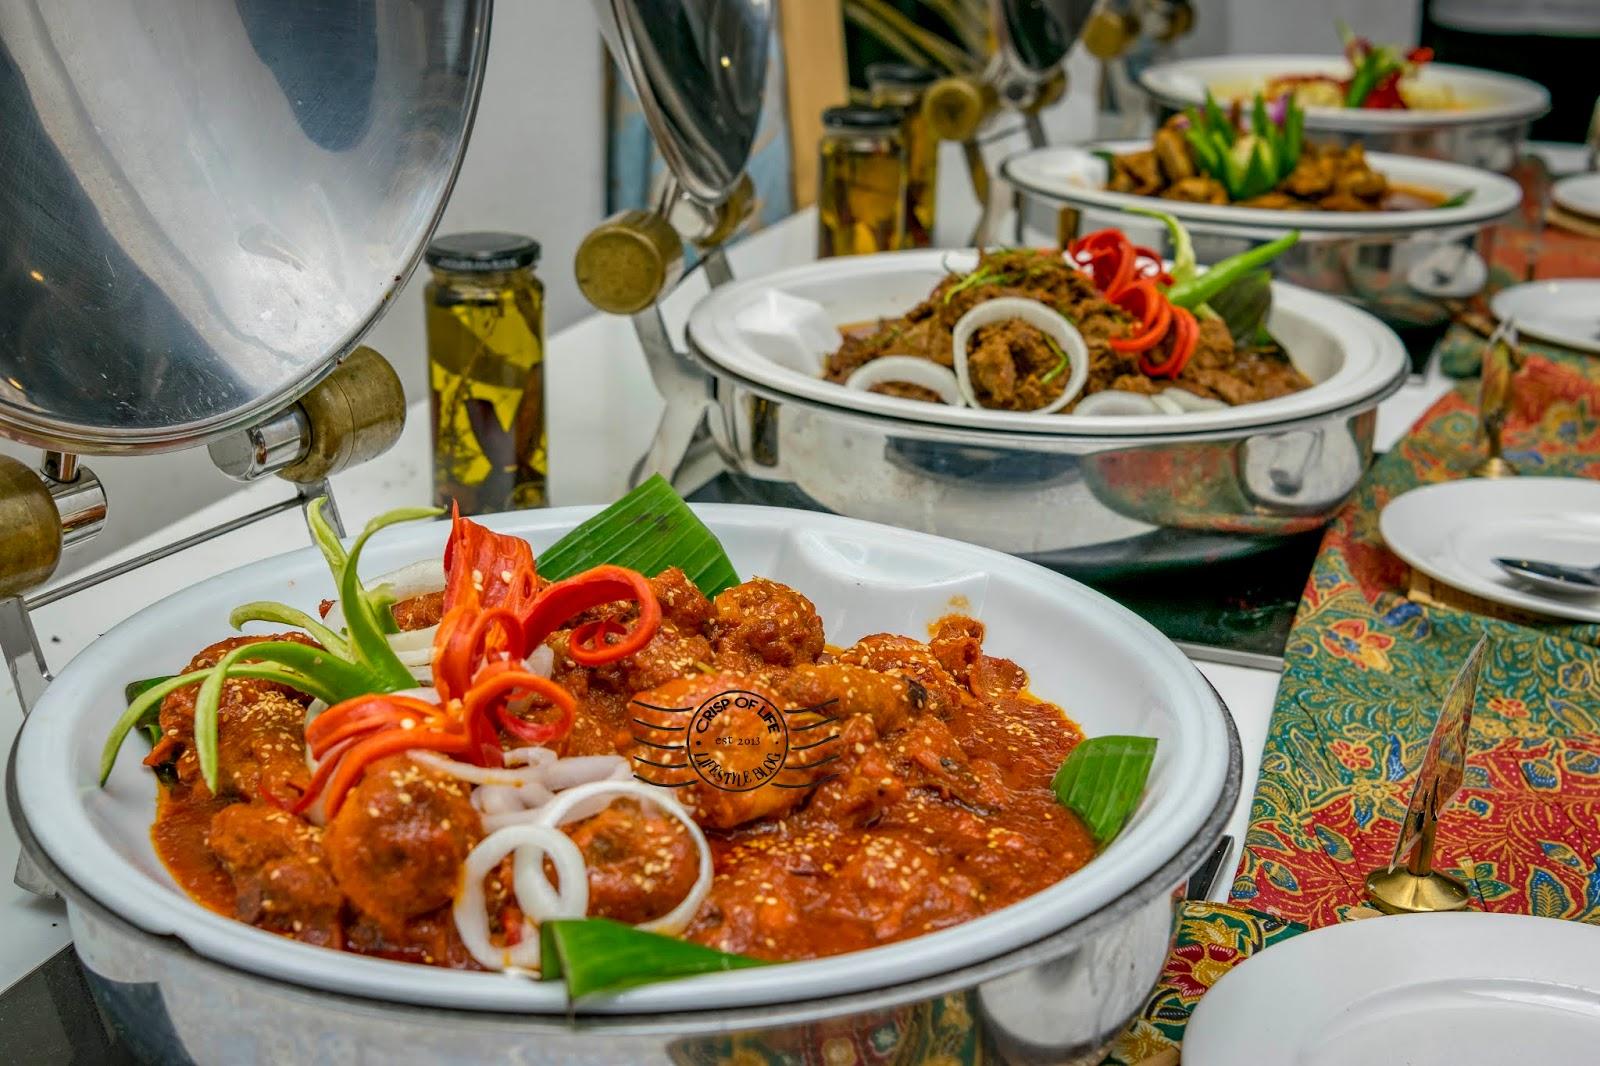 Sajian Nostalgia Ramadan Buffet 2019 @ Royale Chulan Penang